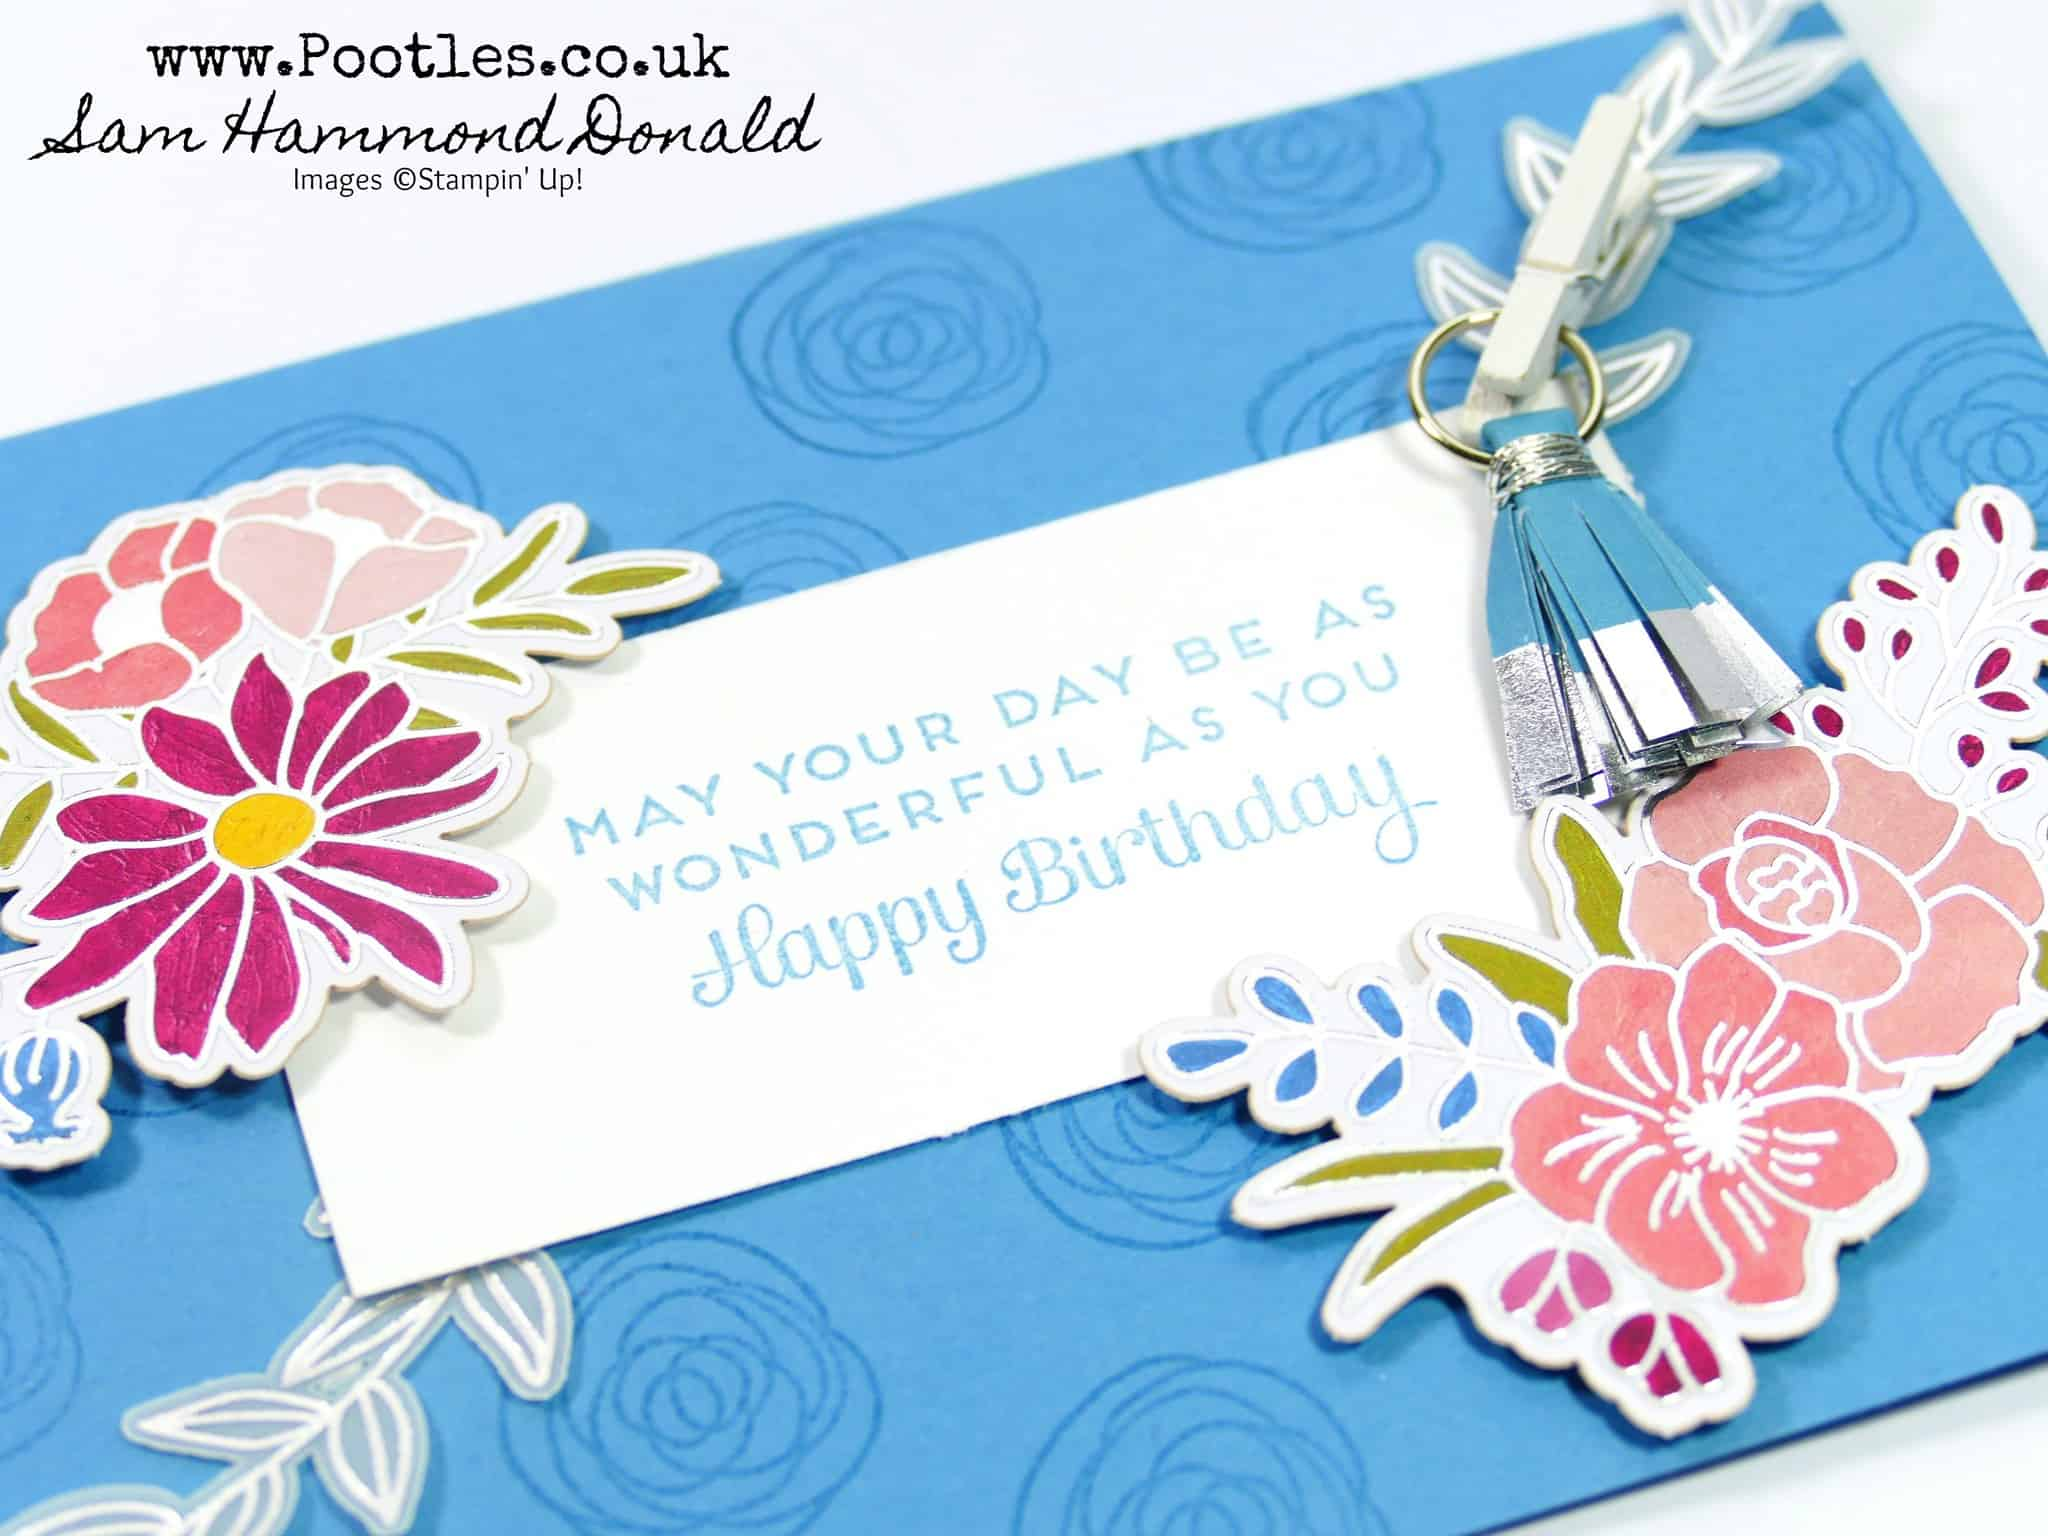 Super Quick Sweet Soiree Embellishment Kit Card!